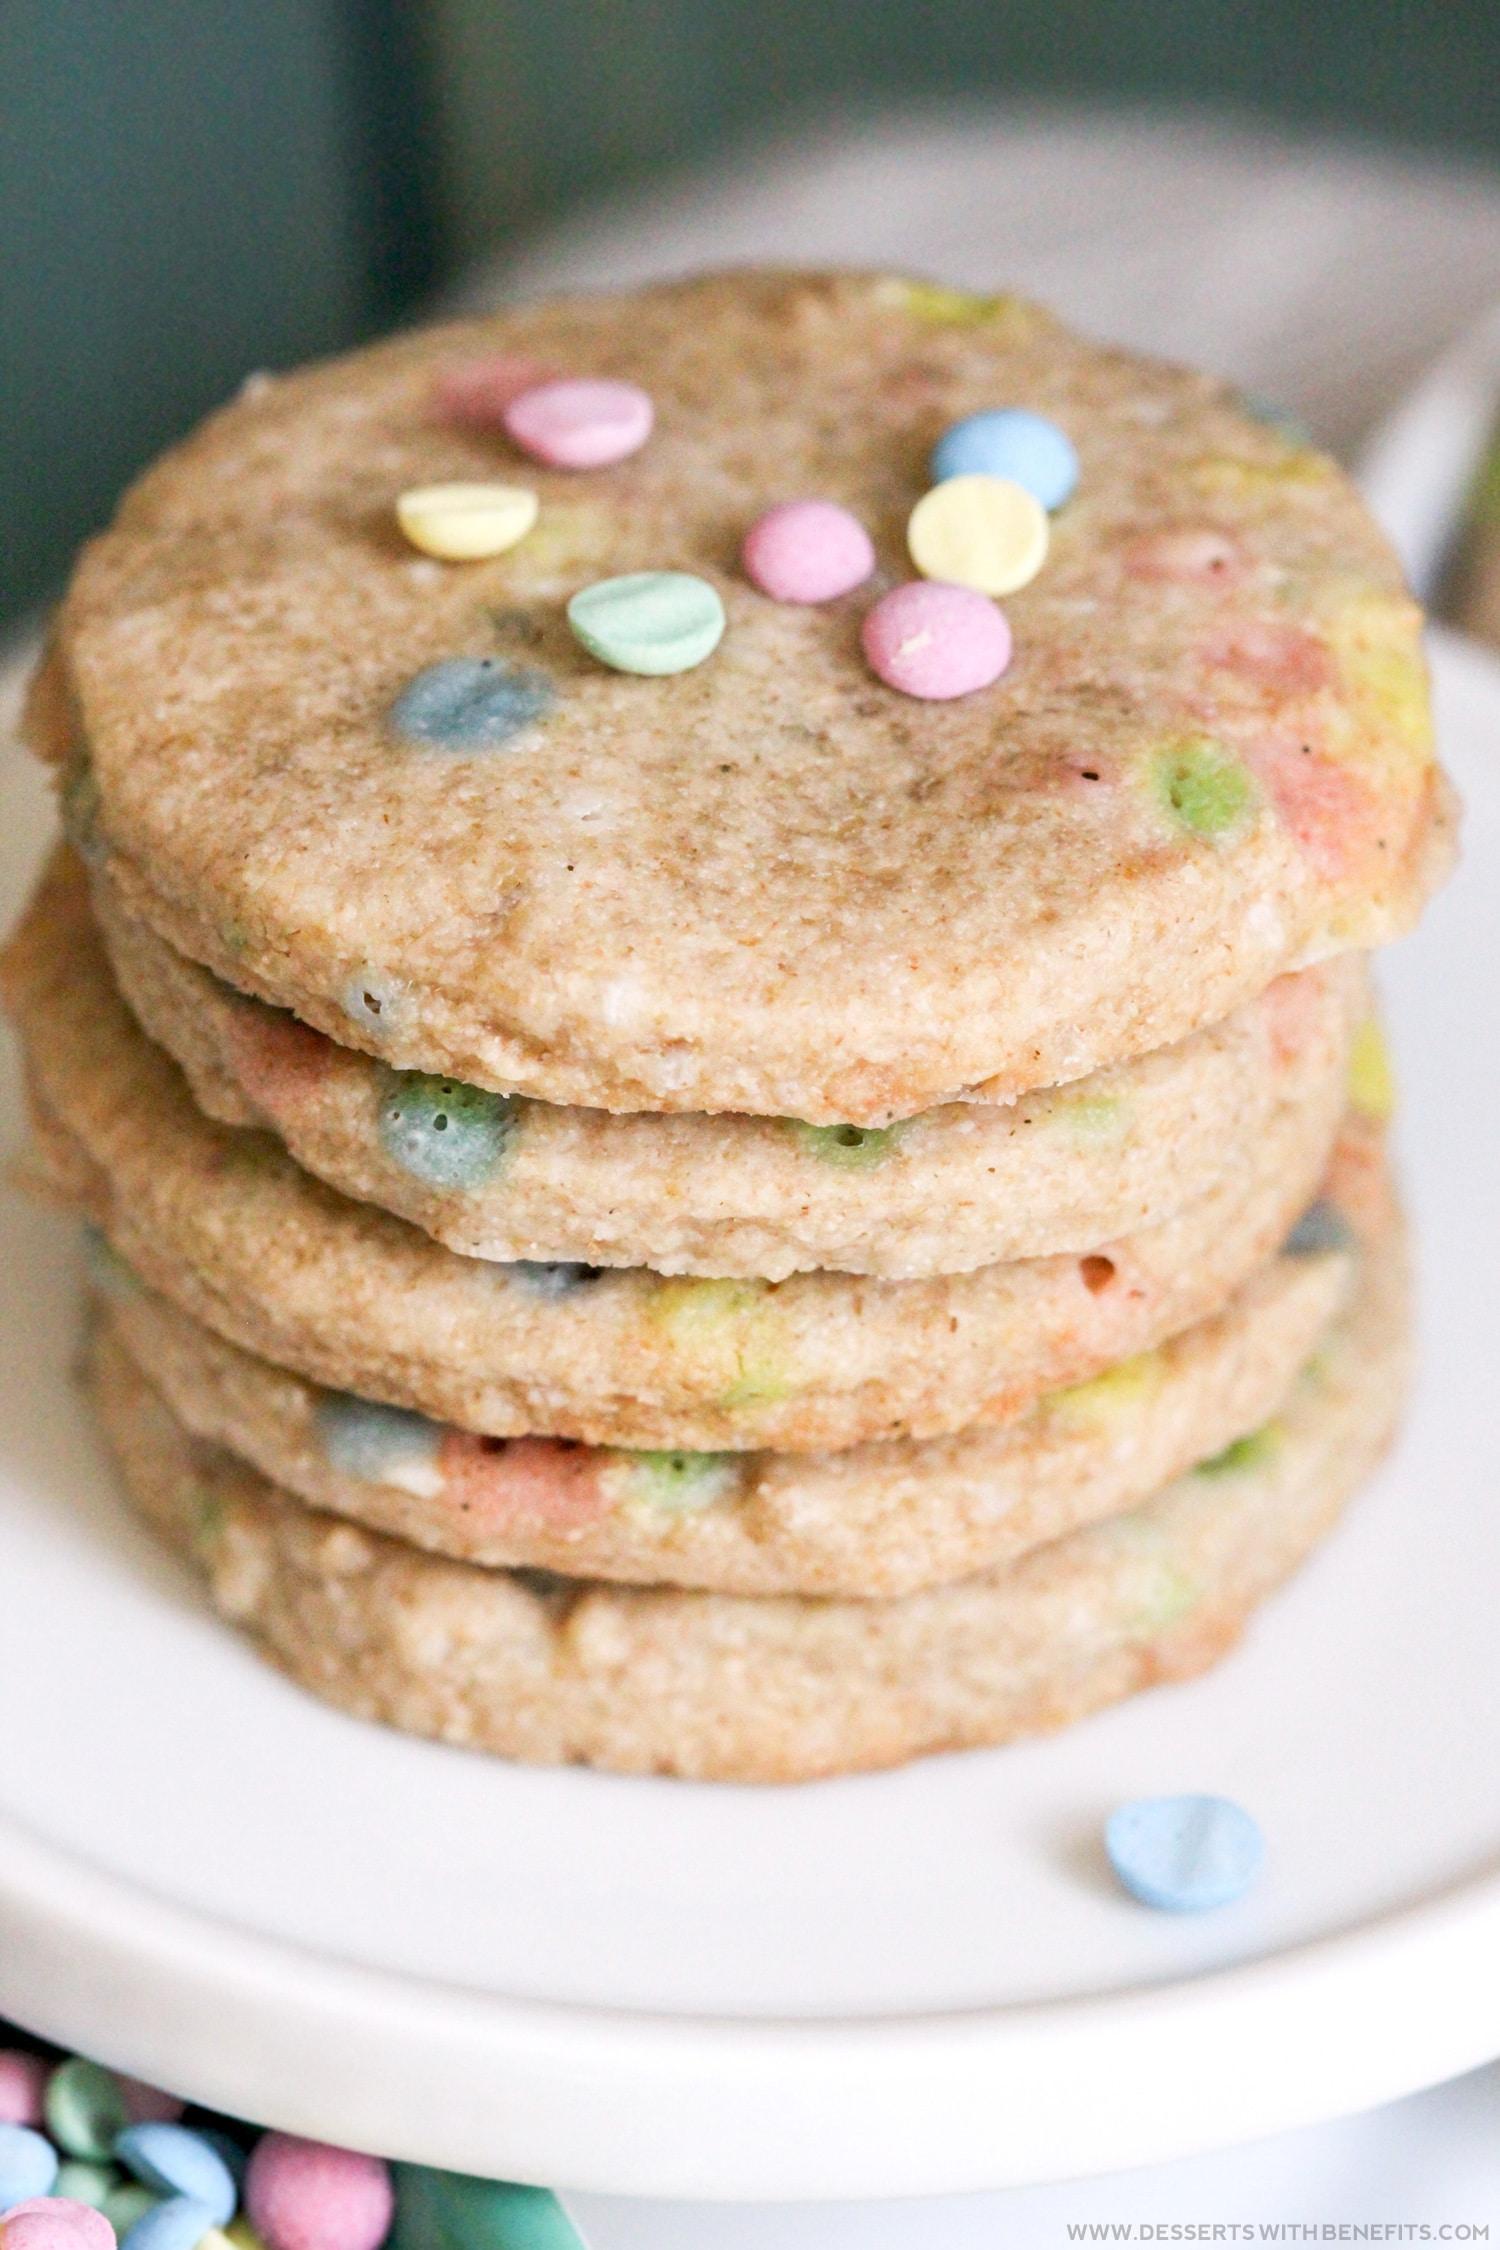 Healthy Funfetti Shortbread Cookies recipe (sugar free, gluten free, dairy free, vegan) - Healthy Dessert Recipes at Desserts with Benefits